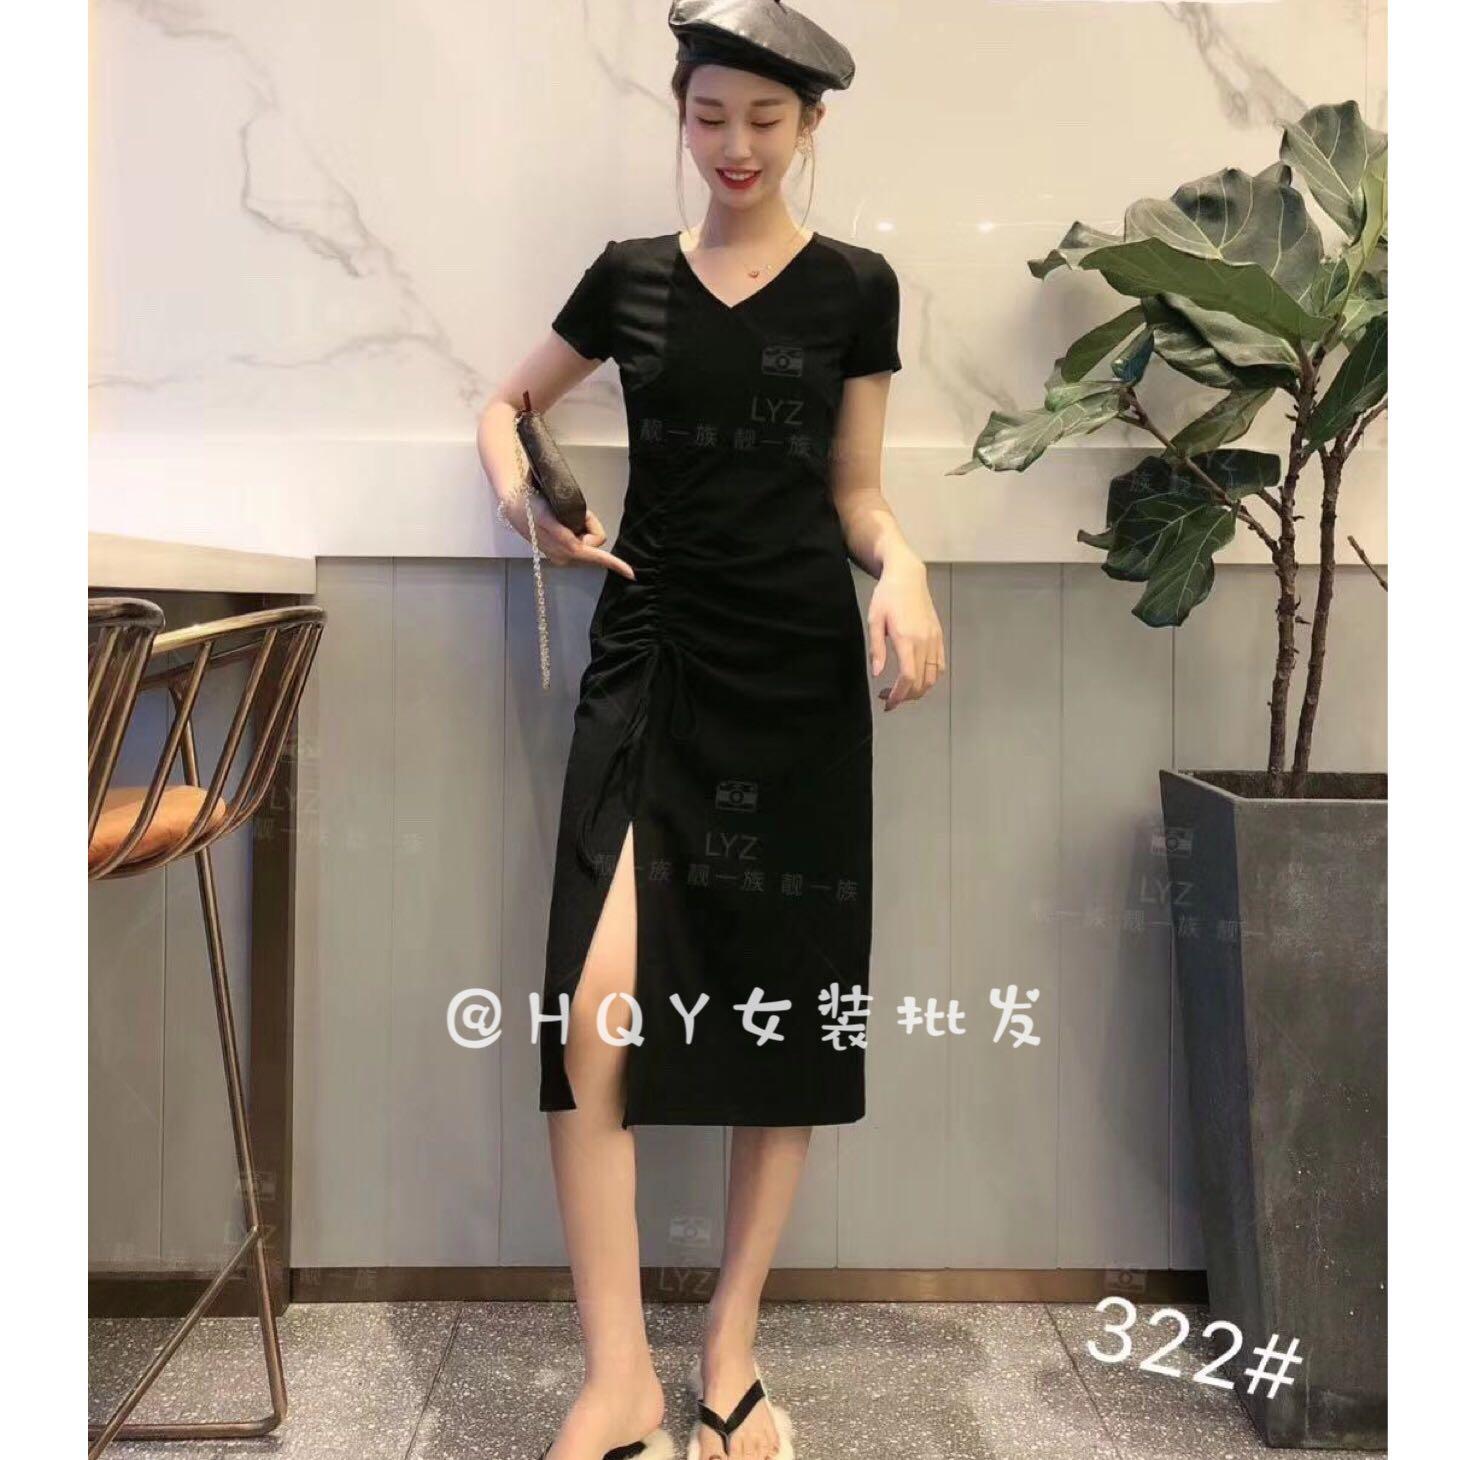 hqy 2019秋新款显瘦简约小女连衣裙热销11件有赠品